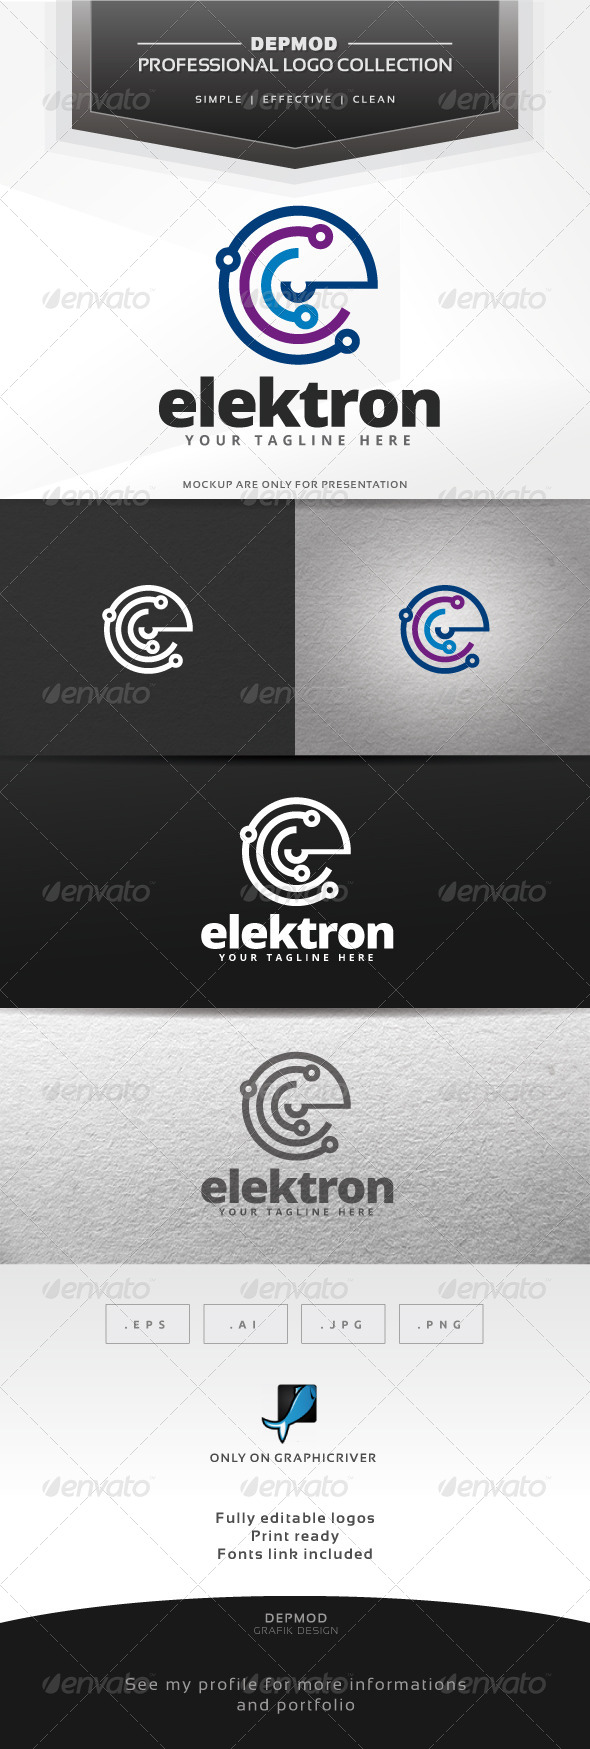 GraphicRiver Elektron Logo 6417306